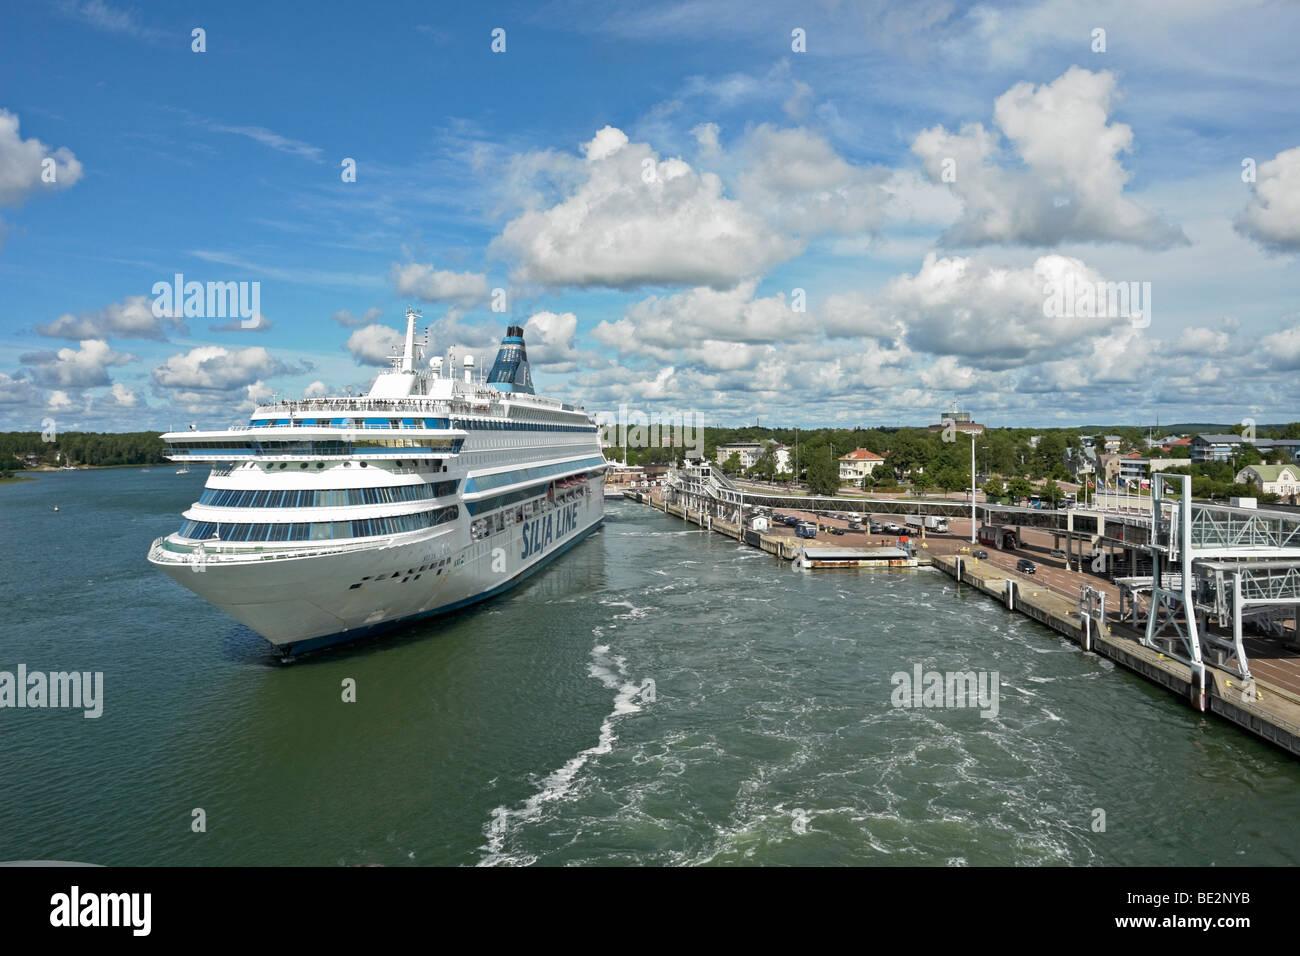 Silja Line ferry Silja Europa departs Mariehamn in the Aaland Islands en route from Stockholm to Turku - Stock Image